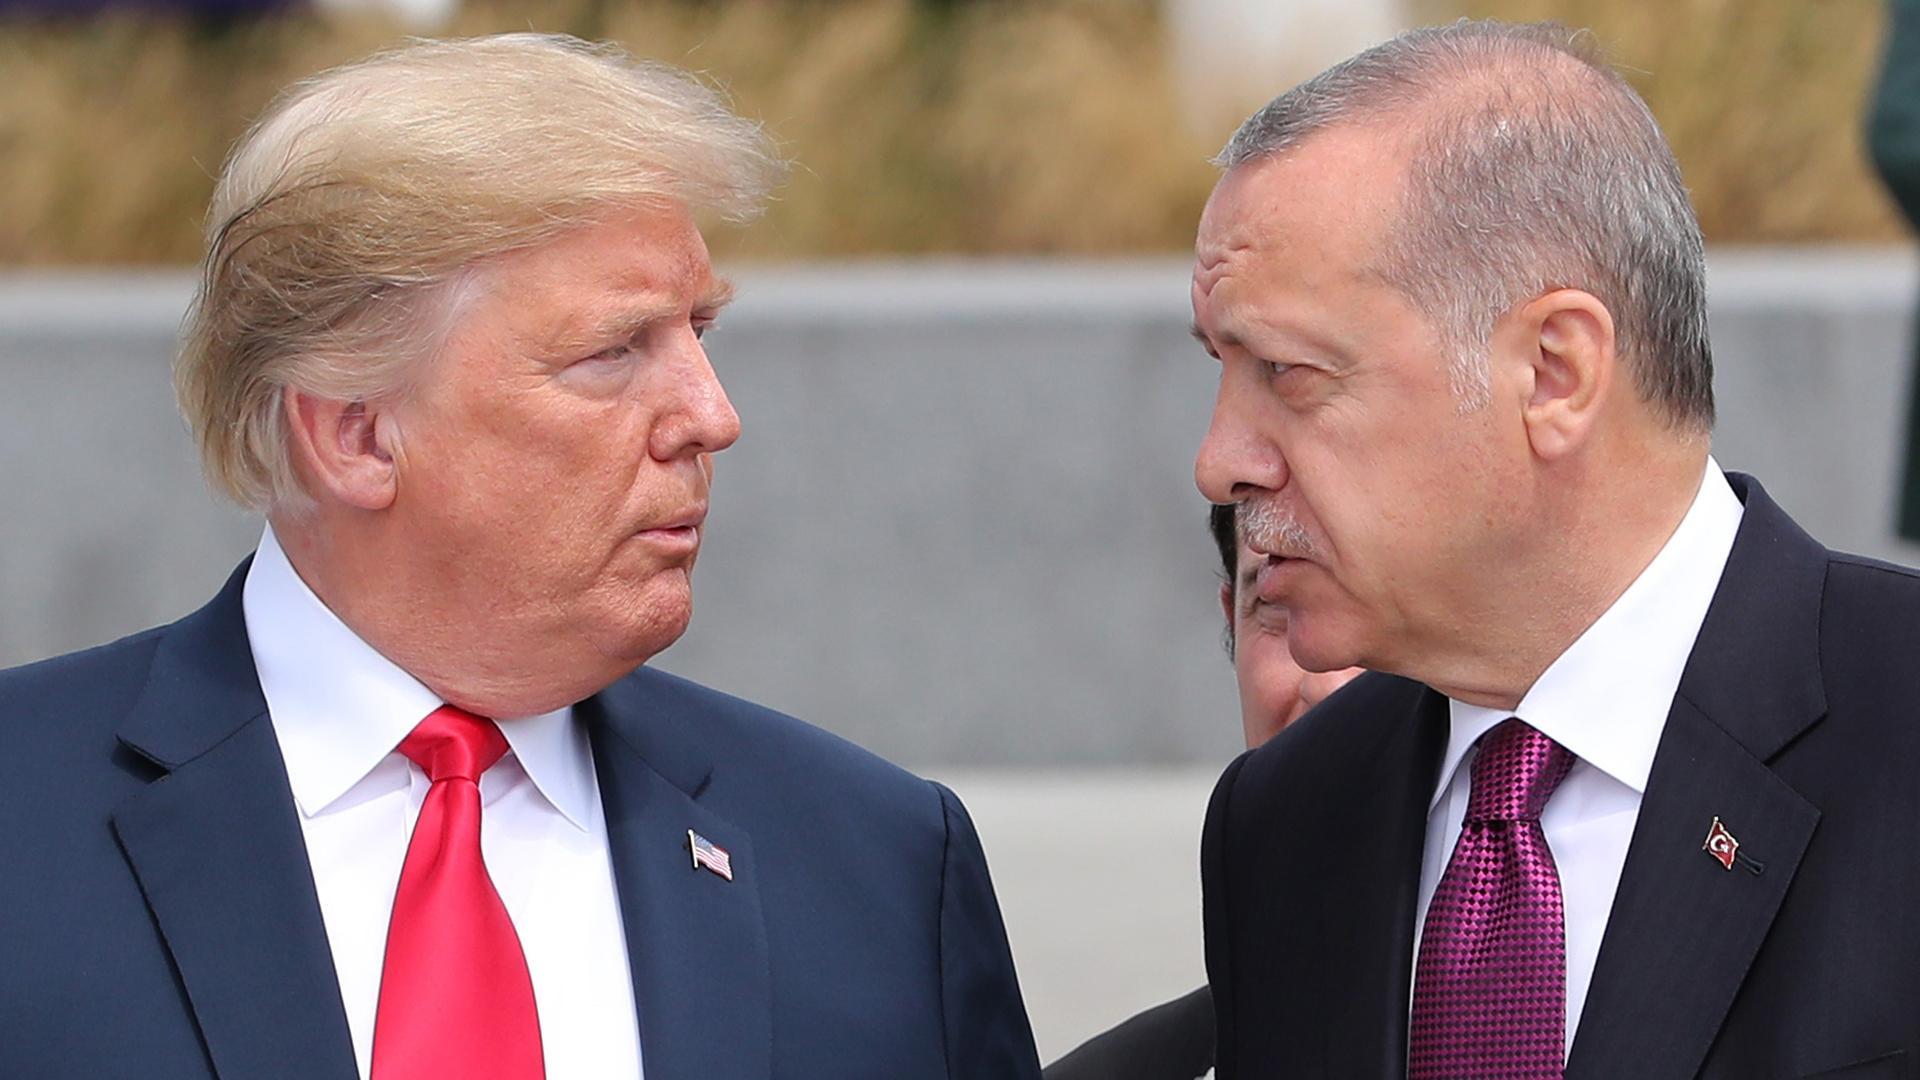 America and Turkey, FRIENDS or FOES?  – KJ Vids